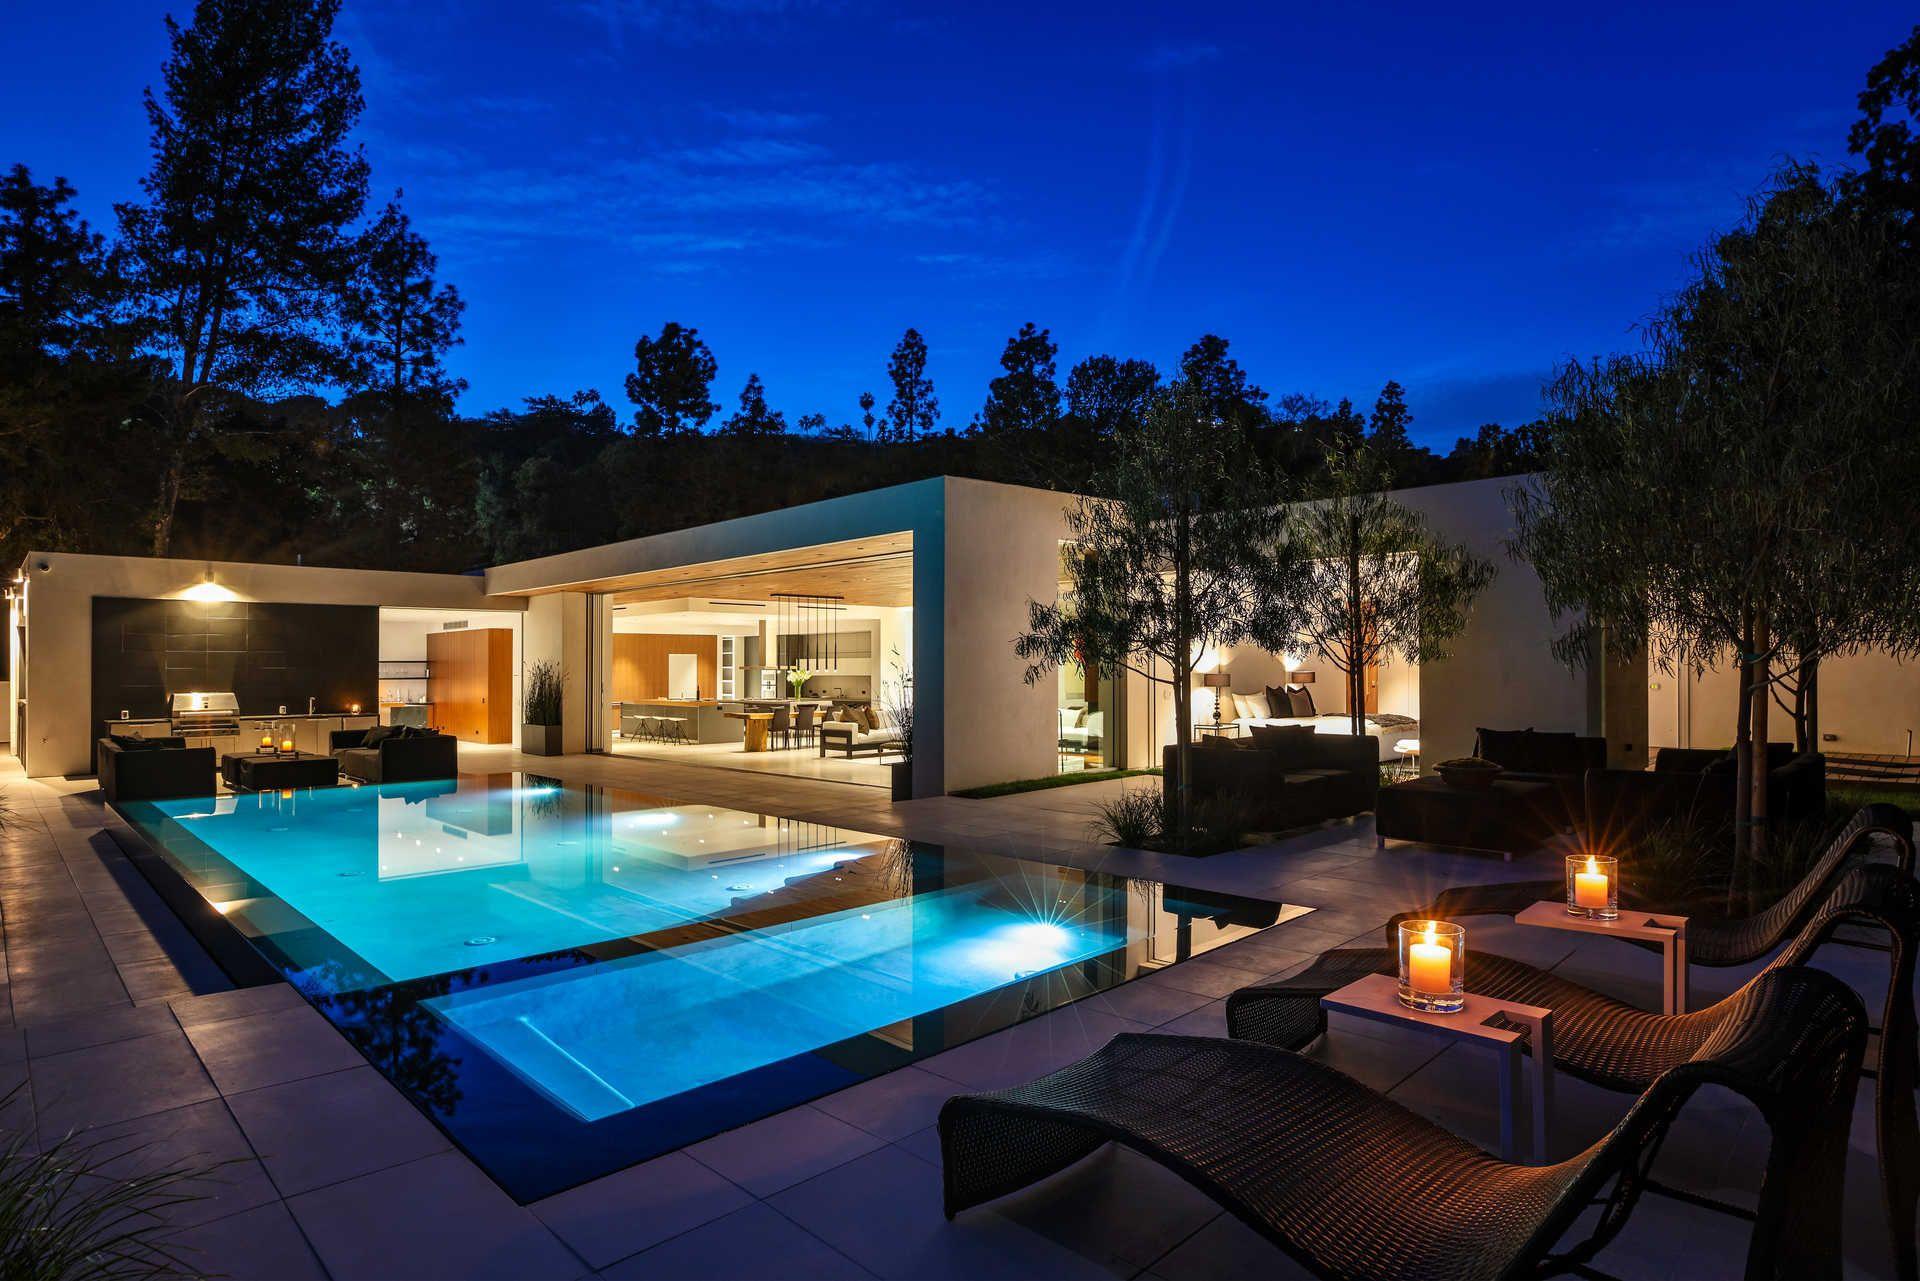 1120 Loma Vista Beverly Hills Property Listing Mls 18338908